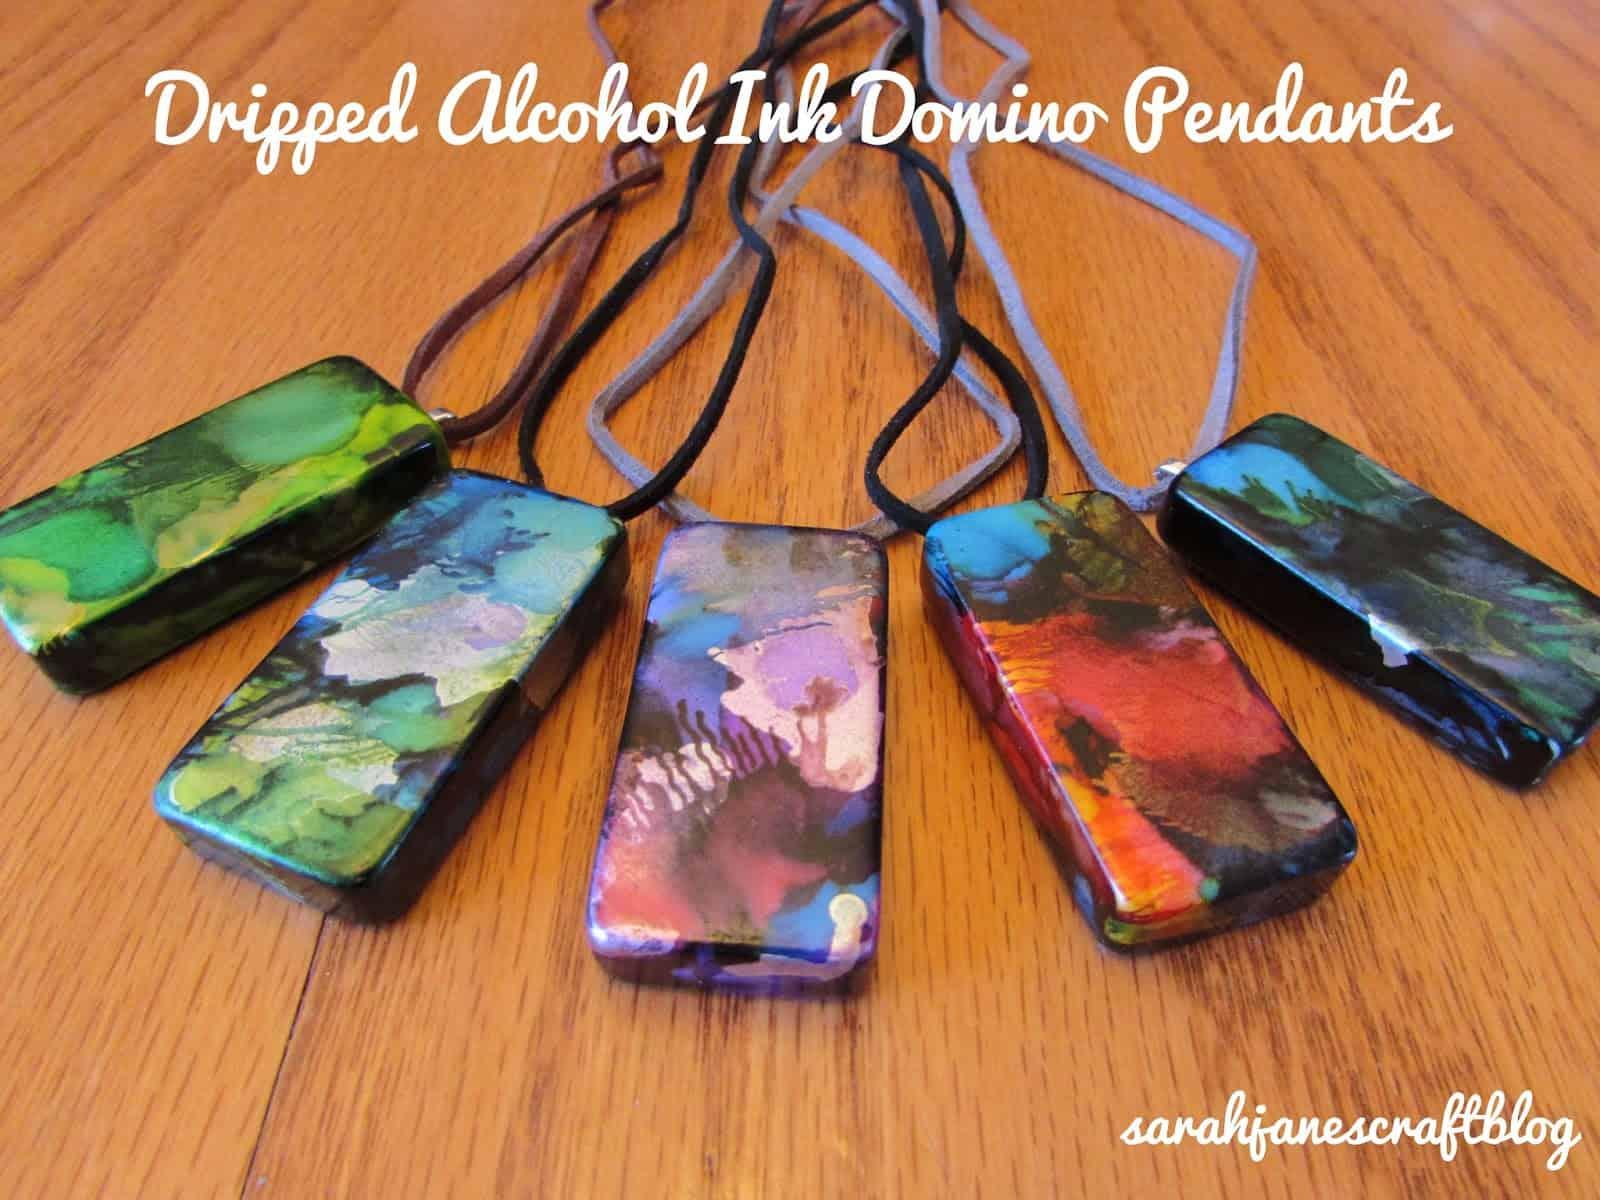 Alcohol ink domino pendants